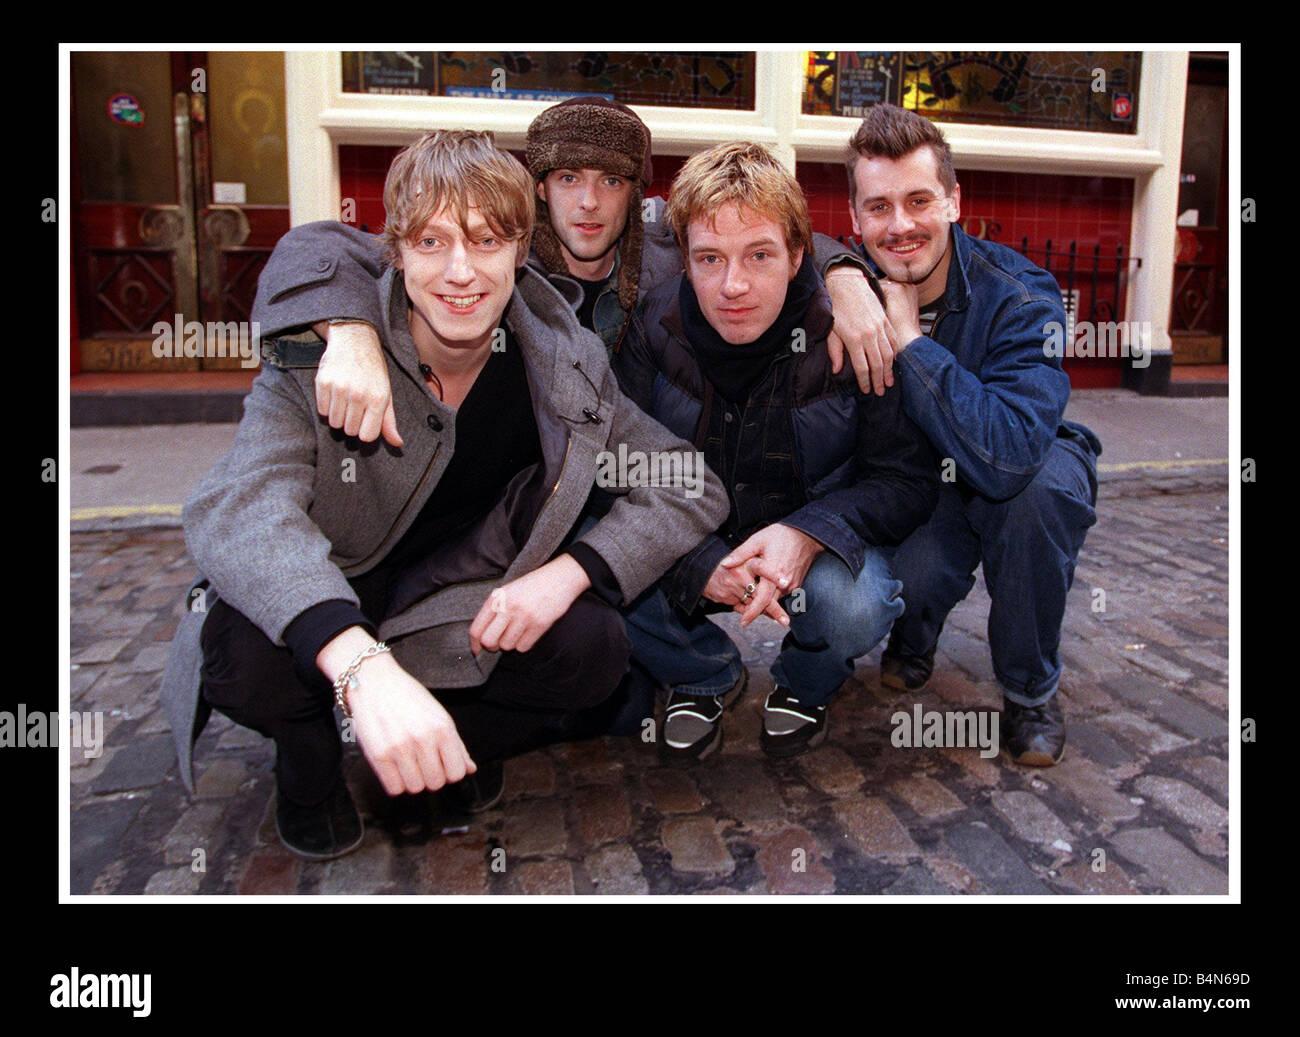 Travis October 1999 at the Horseshoe bar Glasgow Stock Photo